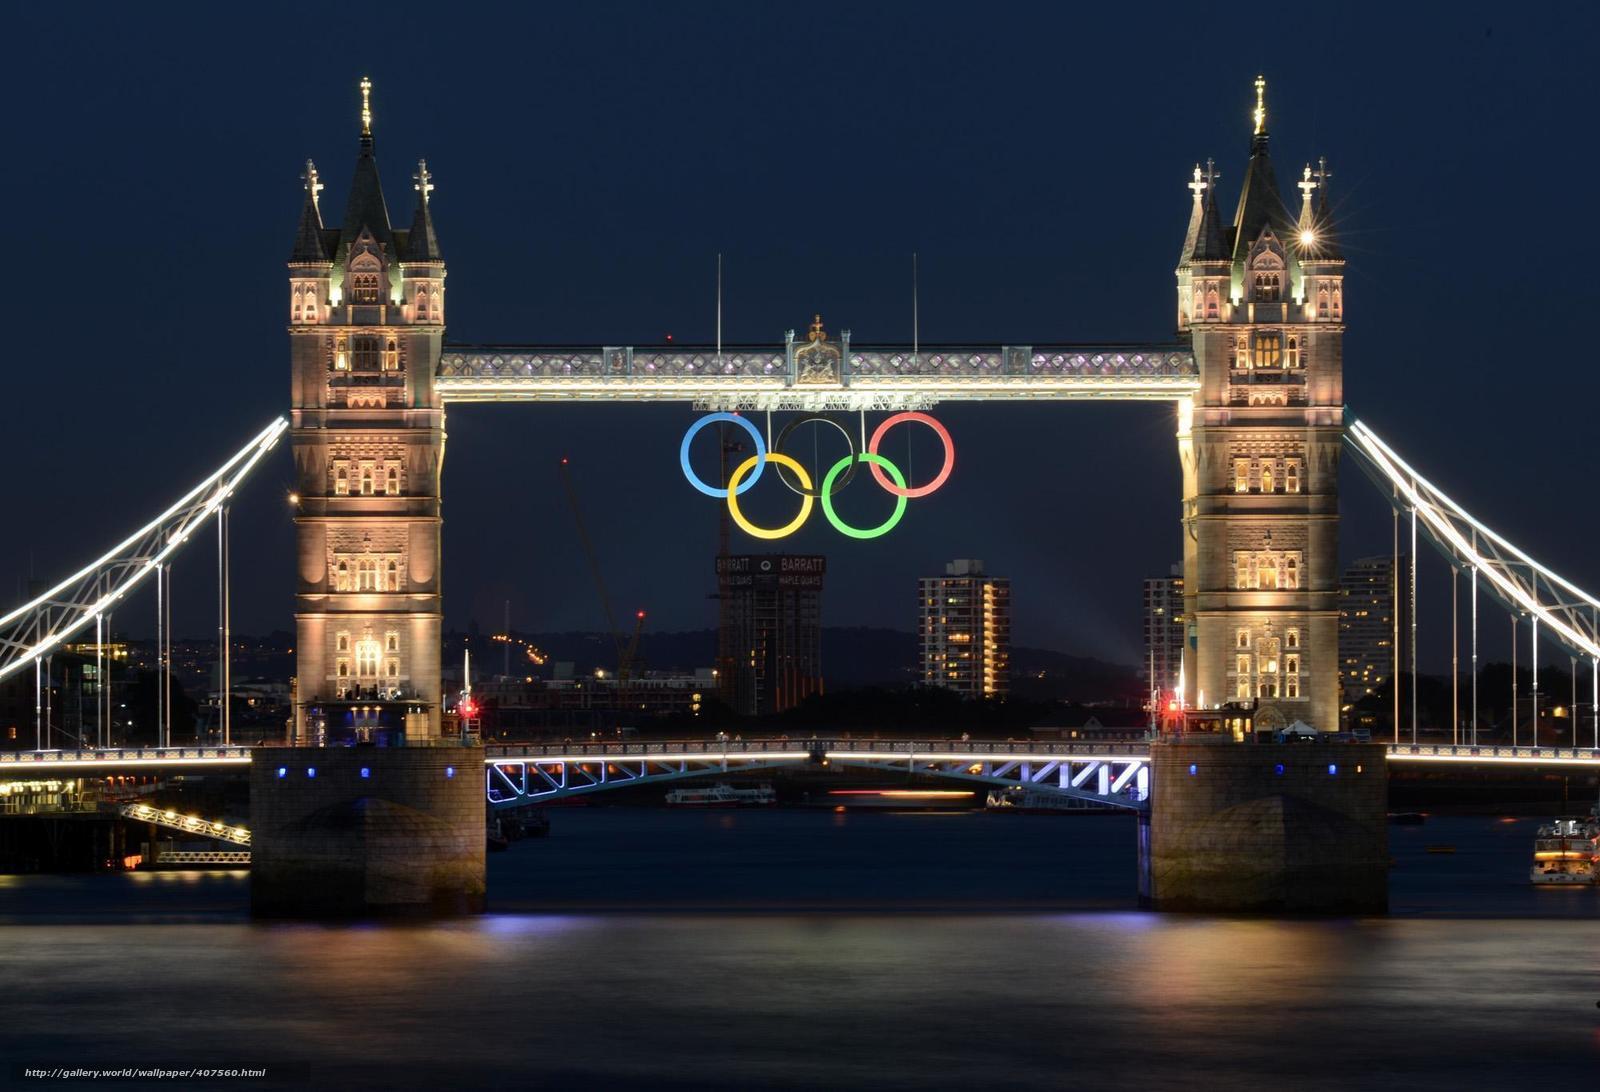 Скачать на телефон обои фото картинку на тему Лондон, река, Темза, мост,...